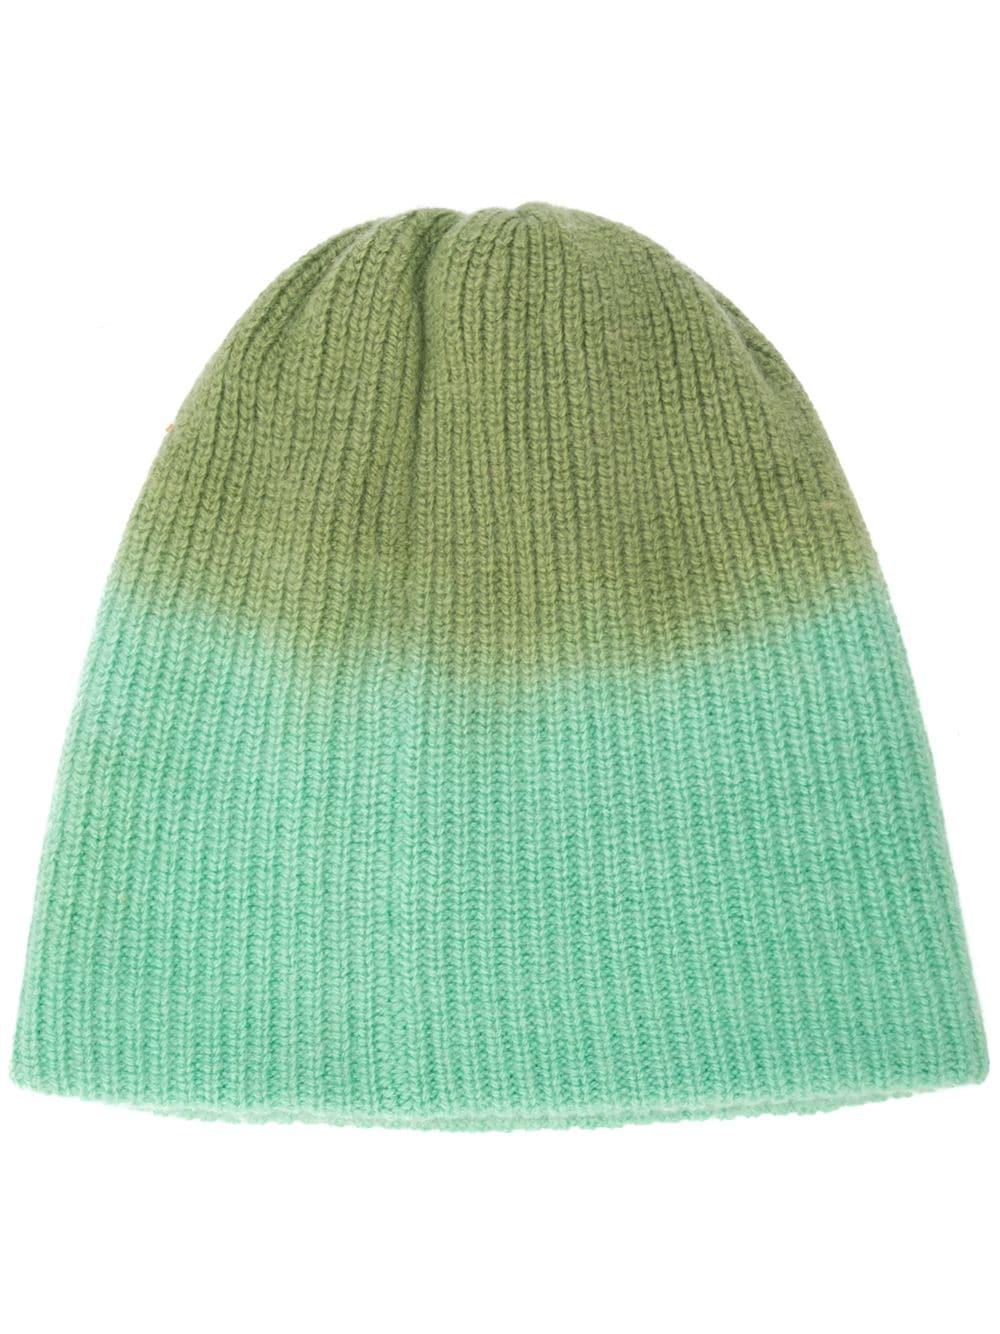 865a9c2cf8b467 The Elder Statesman Dyed Beanie Hat - Green | ModeSens